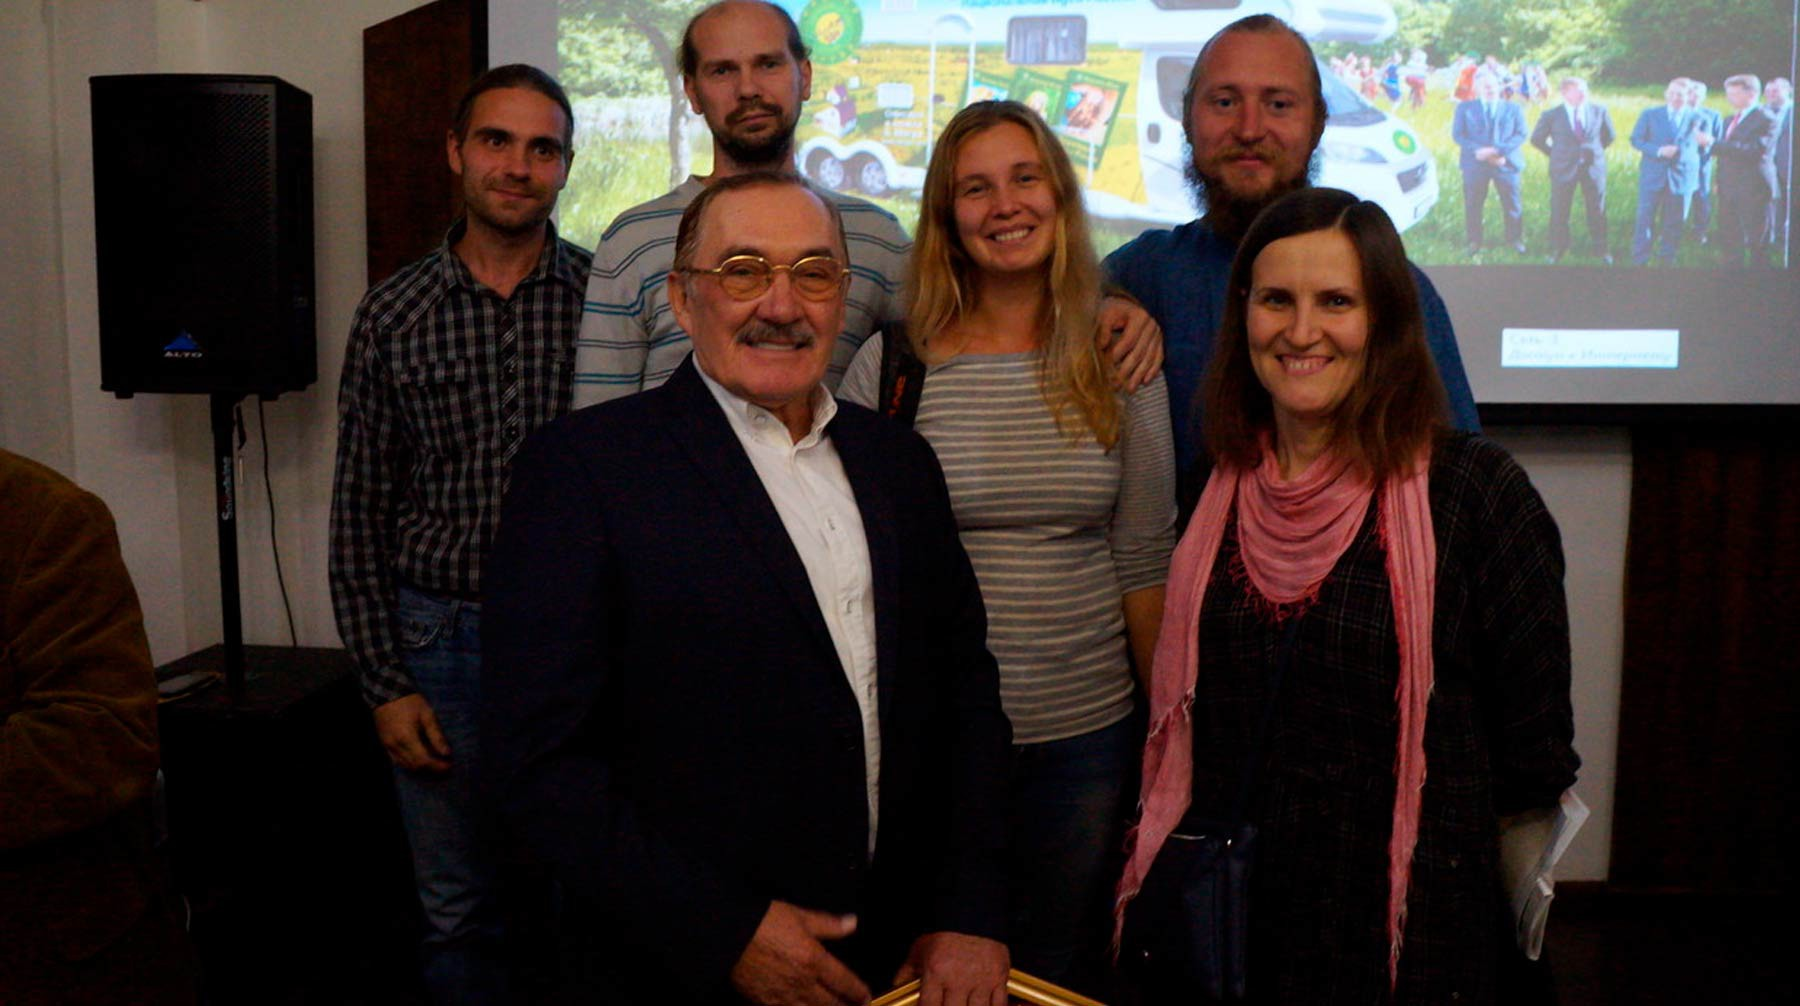 Жители Любодара и Владимир Мегре